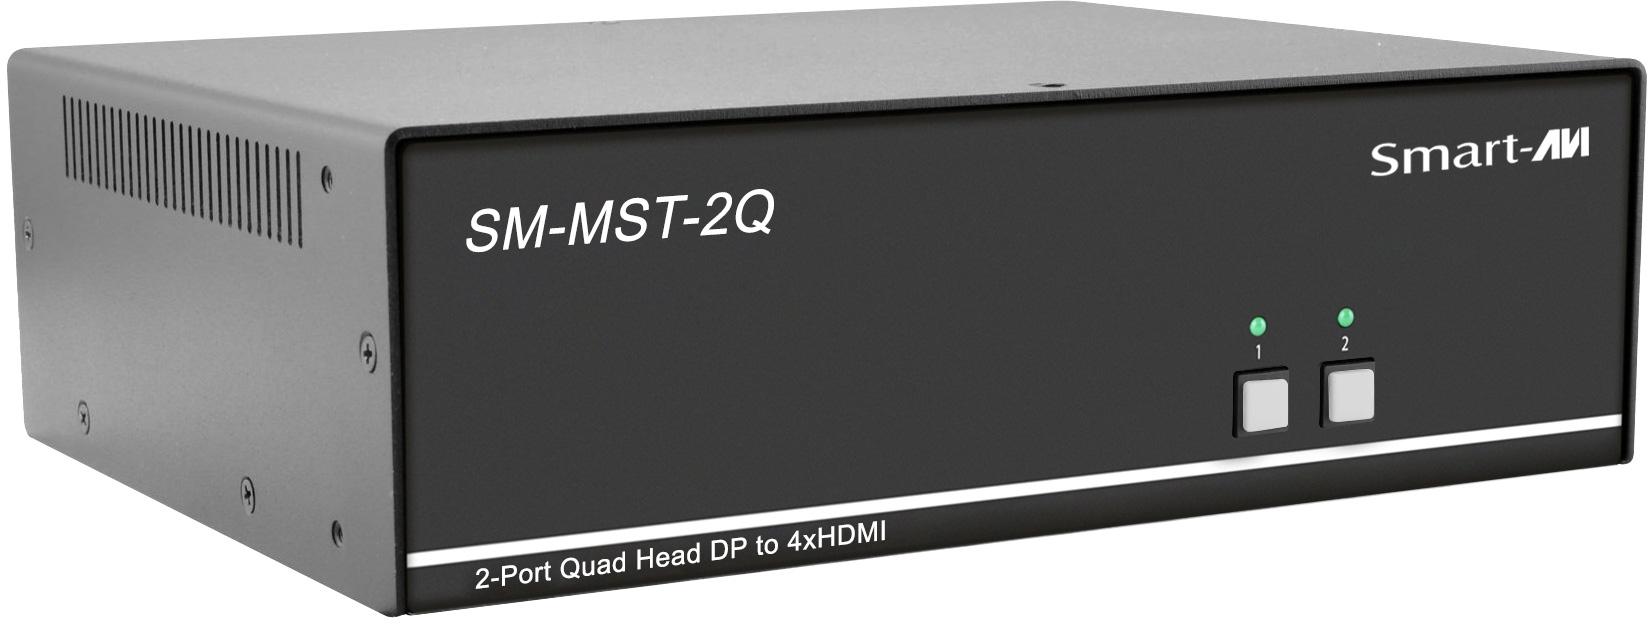 Smart AVI SM-MST-2Q MultiStream Transport Technology KVM Switch with Quad 4K HDMI Out - 2 Port SAVI-SM-MST-2Q